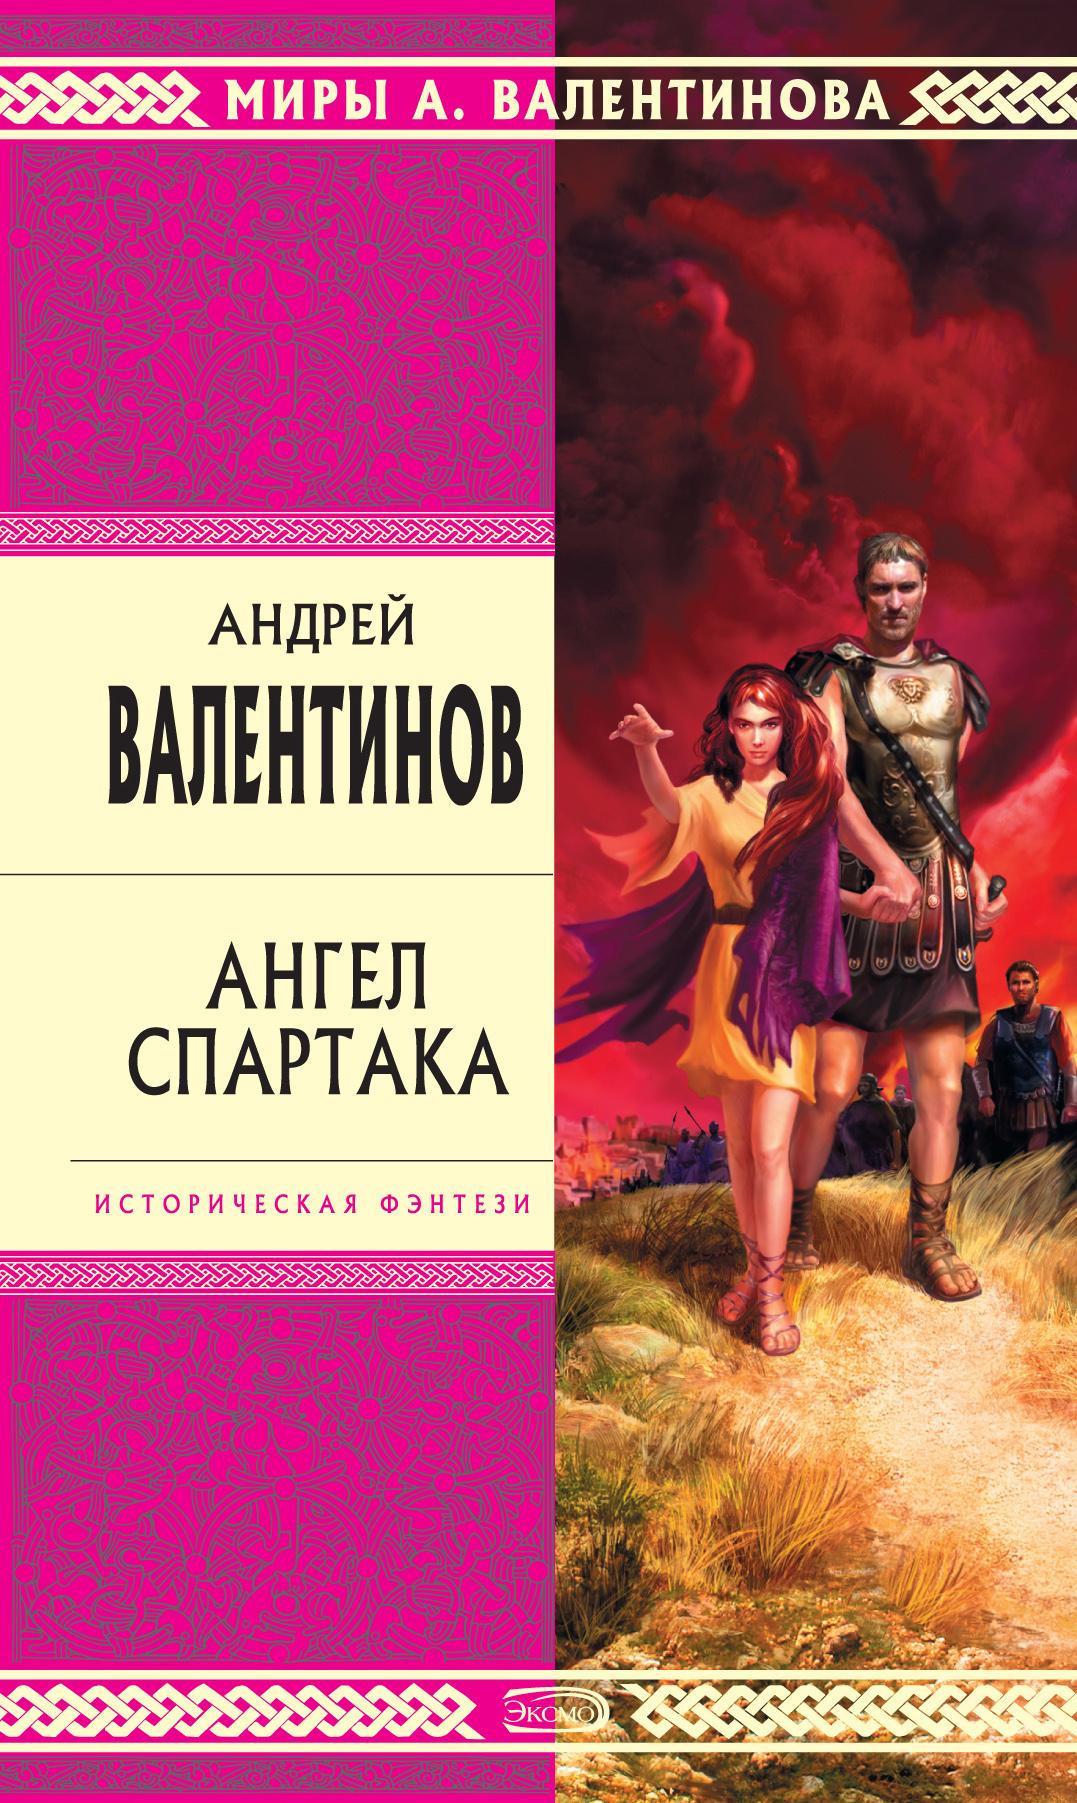 Андрей Валентинов «Ангел Спартака»